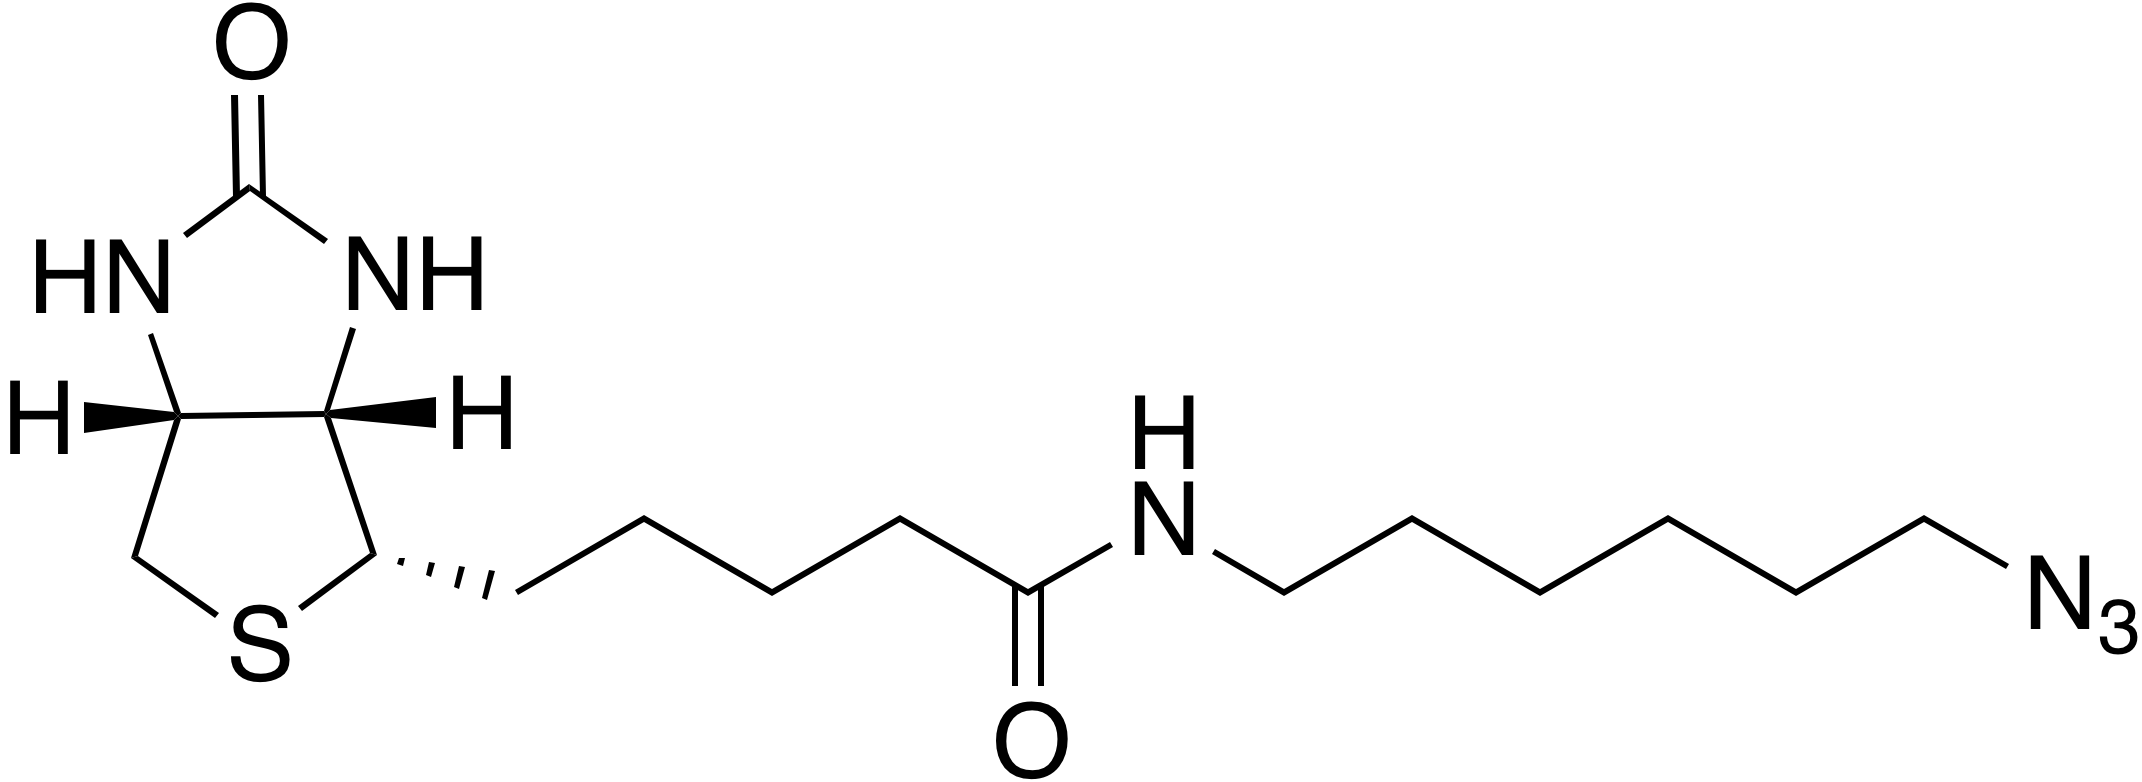 6-(Biotinamido)hexylazide